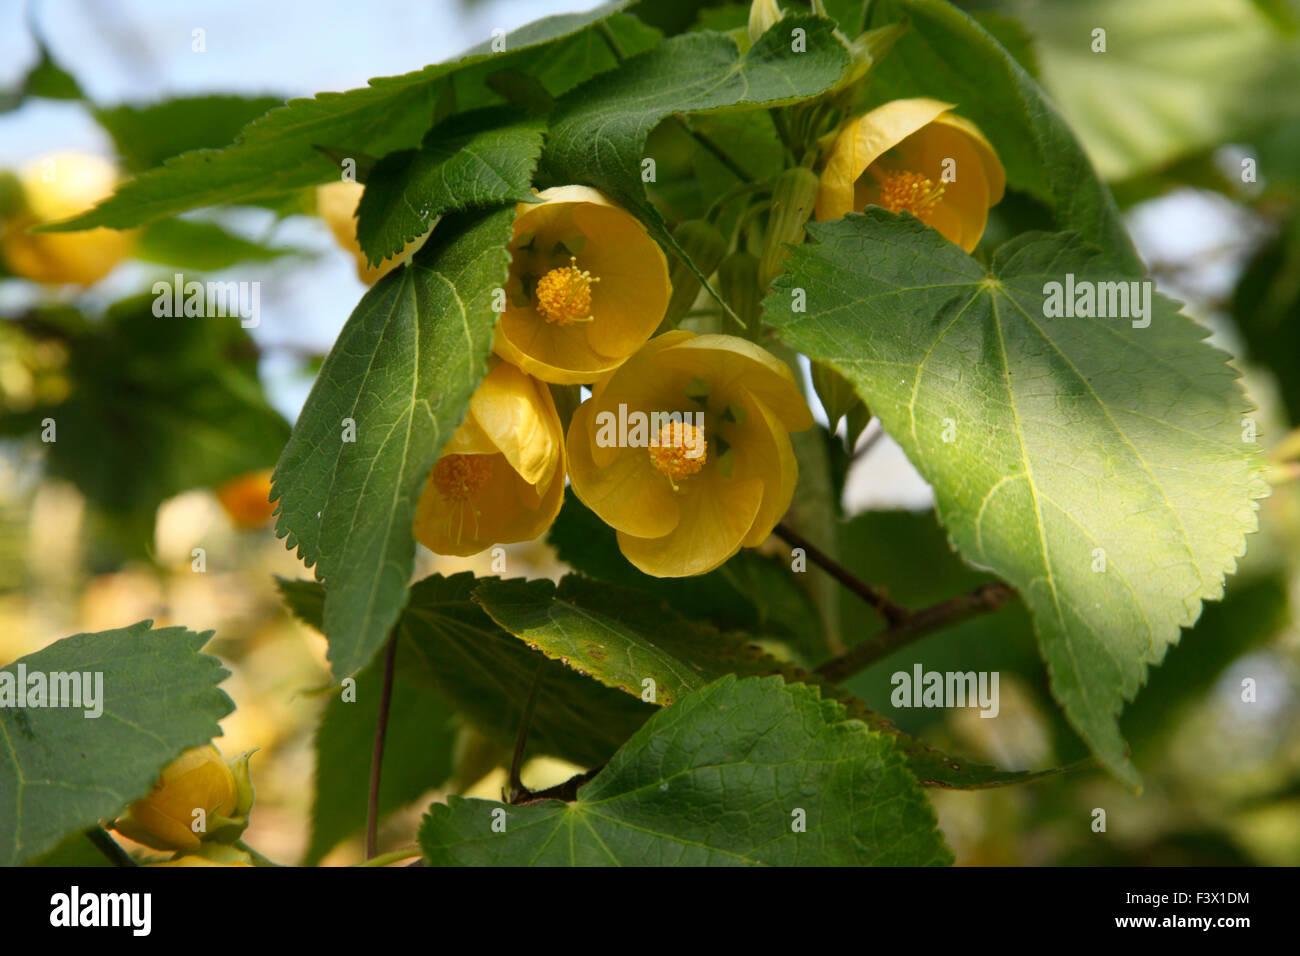 Abutilon Canary Bird Shrub In Flower Close Up Stock Photo